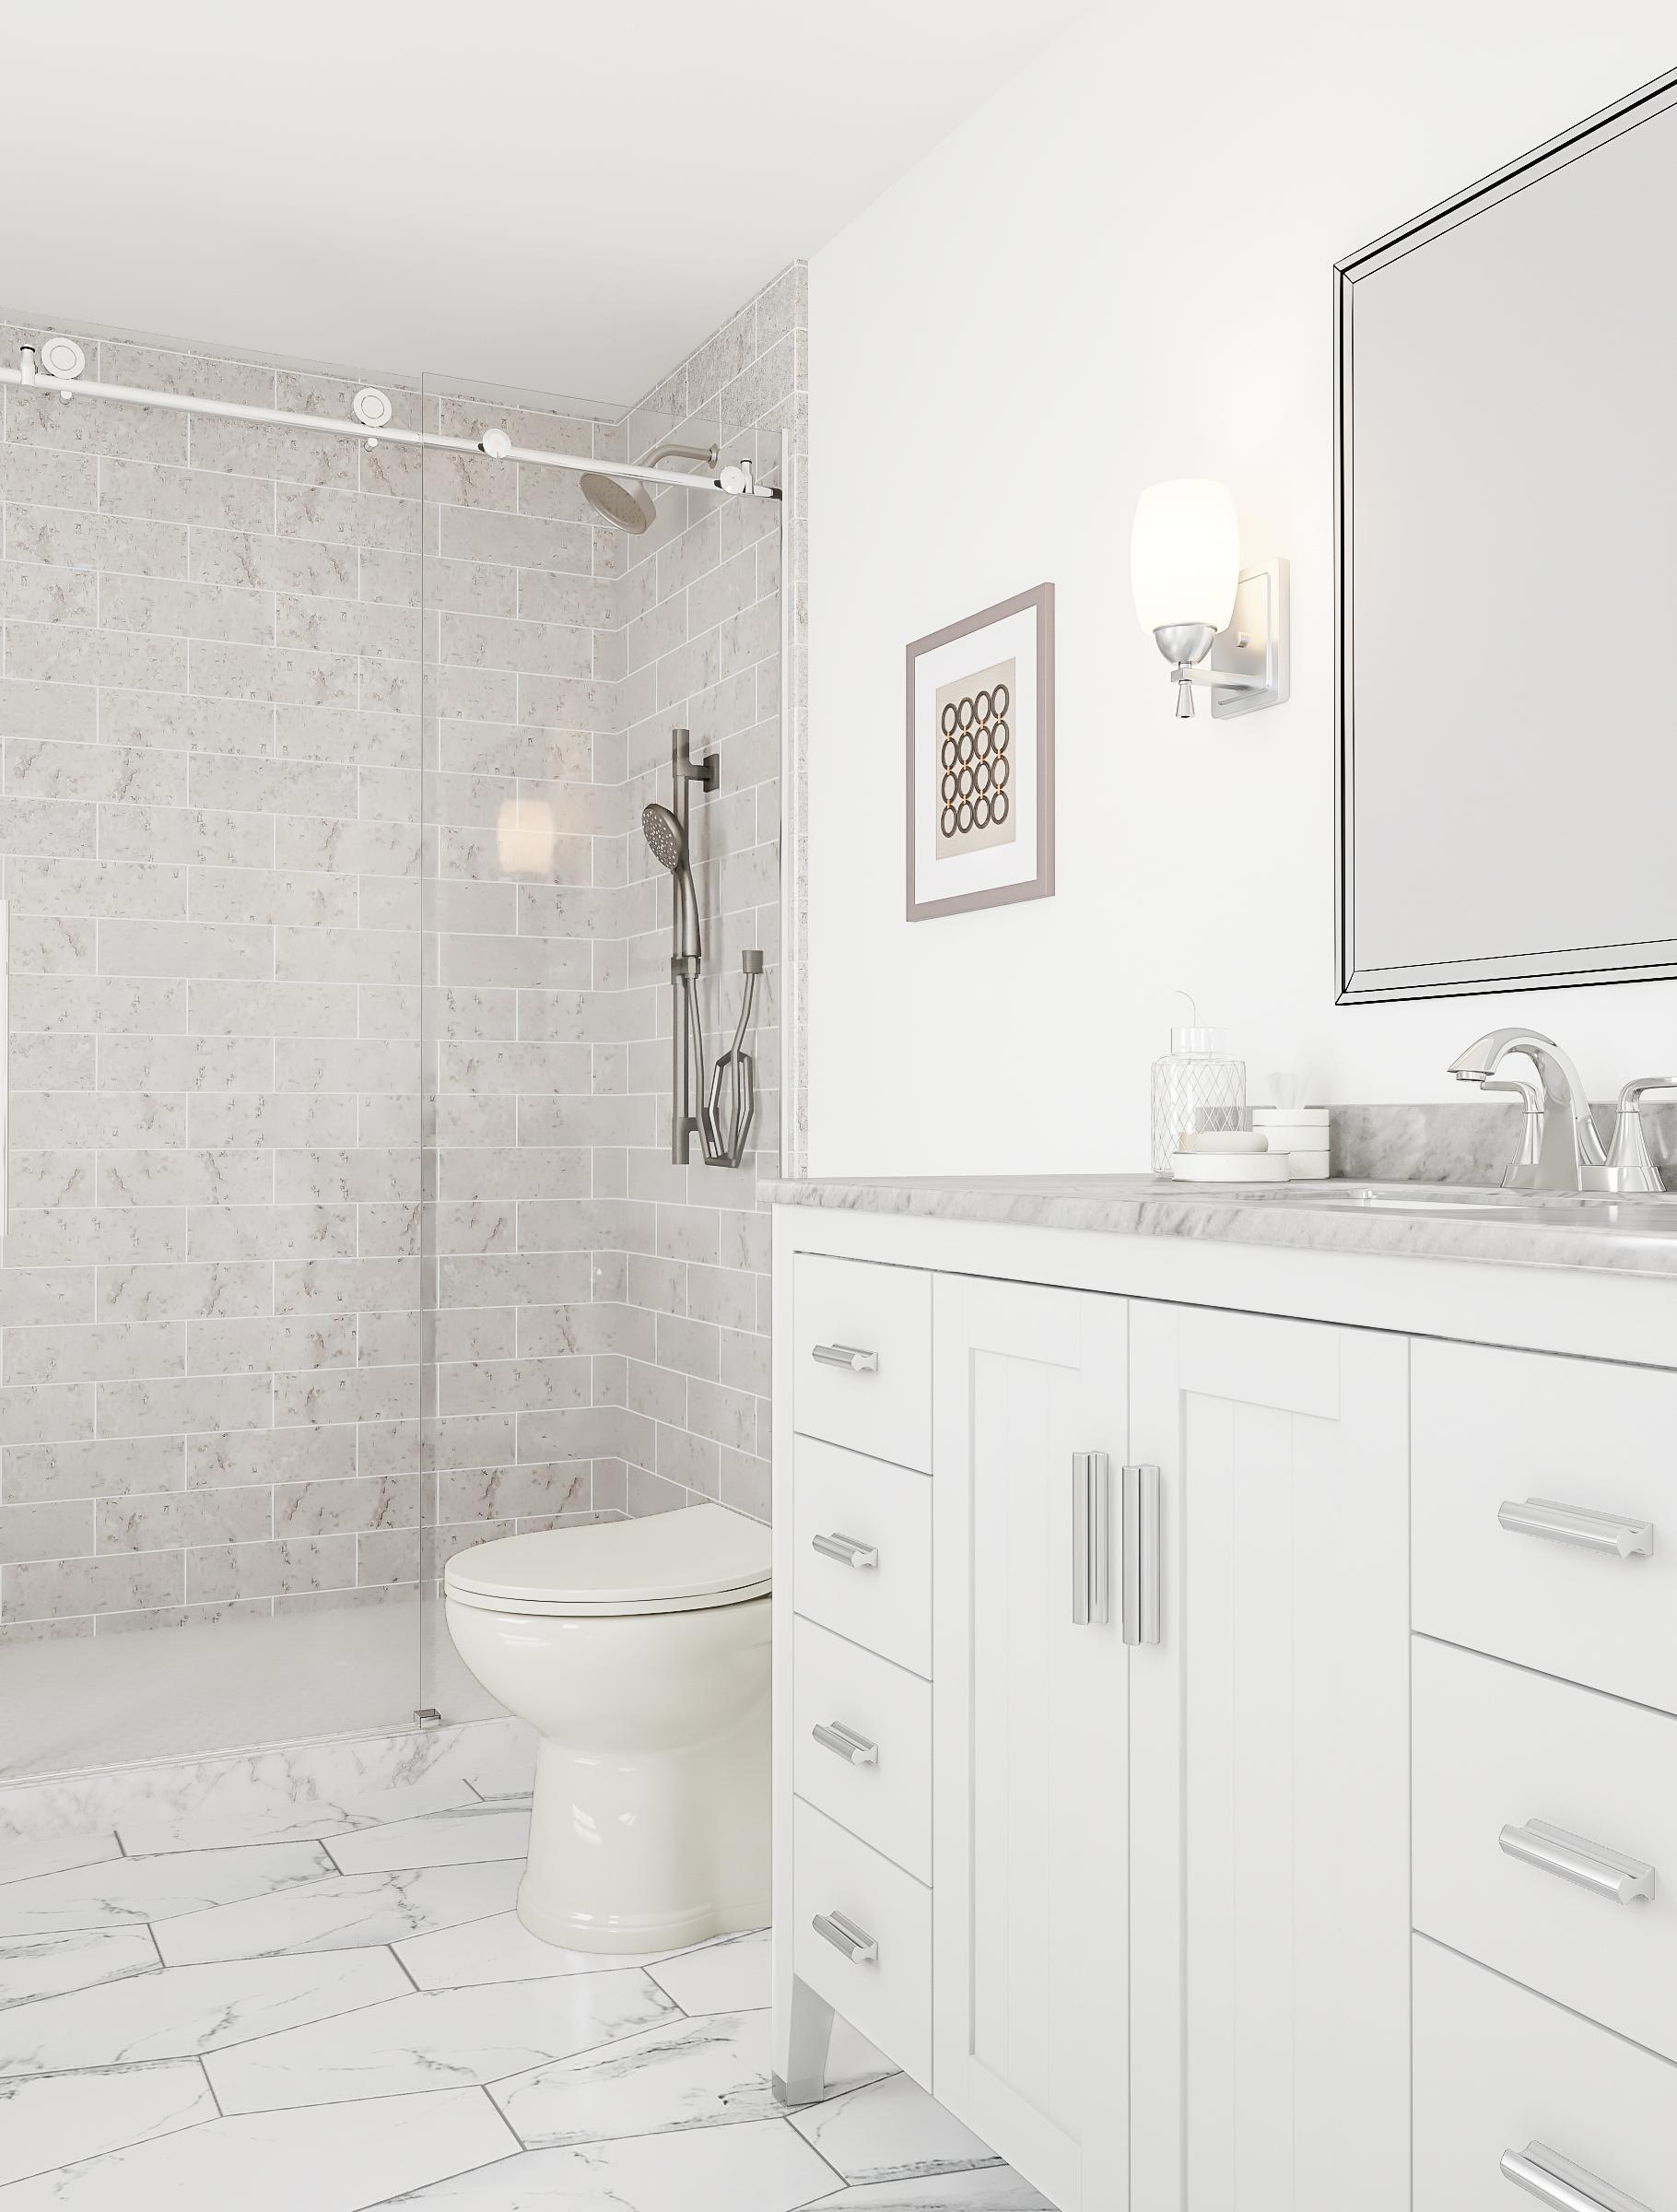 25 Gray And White Small Bathroom Ideas Small Bathroom Contemporary Bathroom Designs Bathroom Design